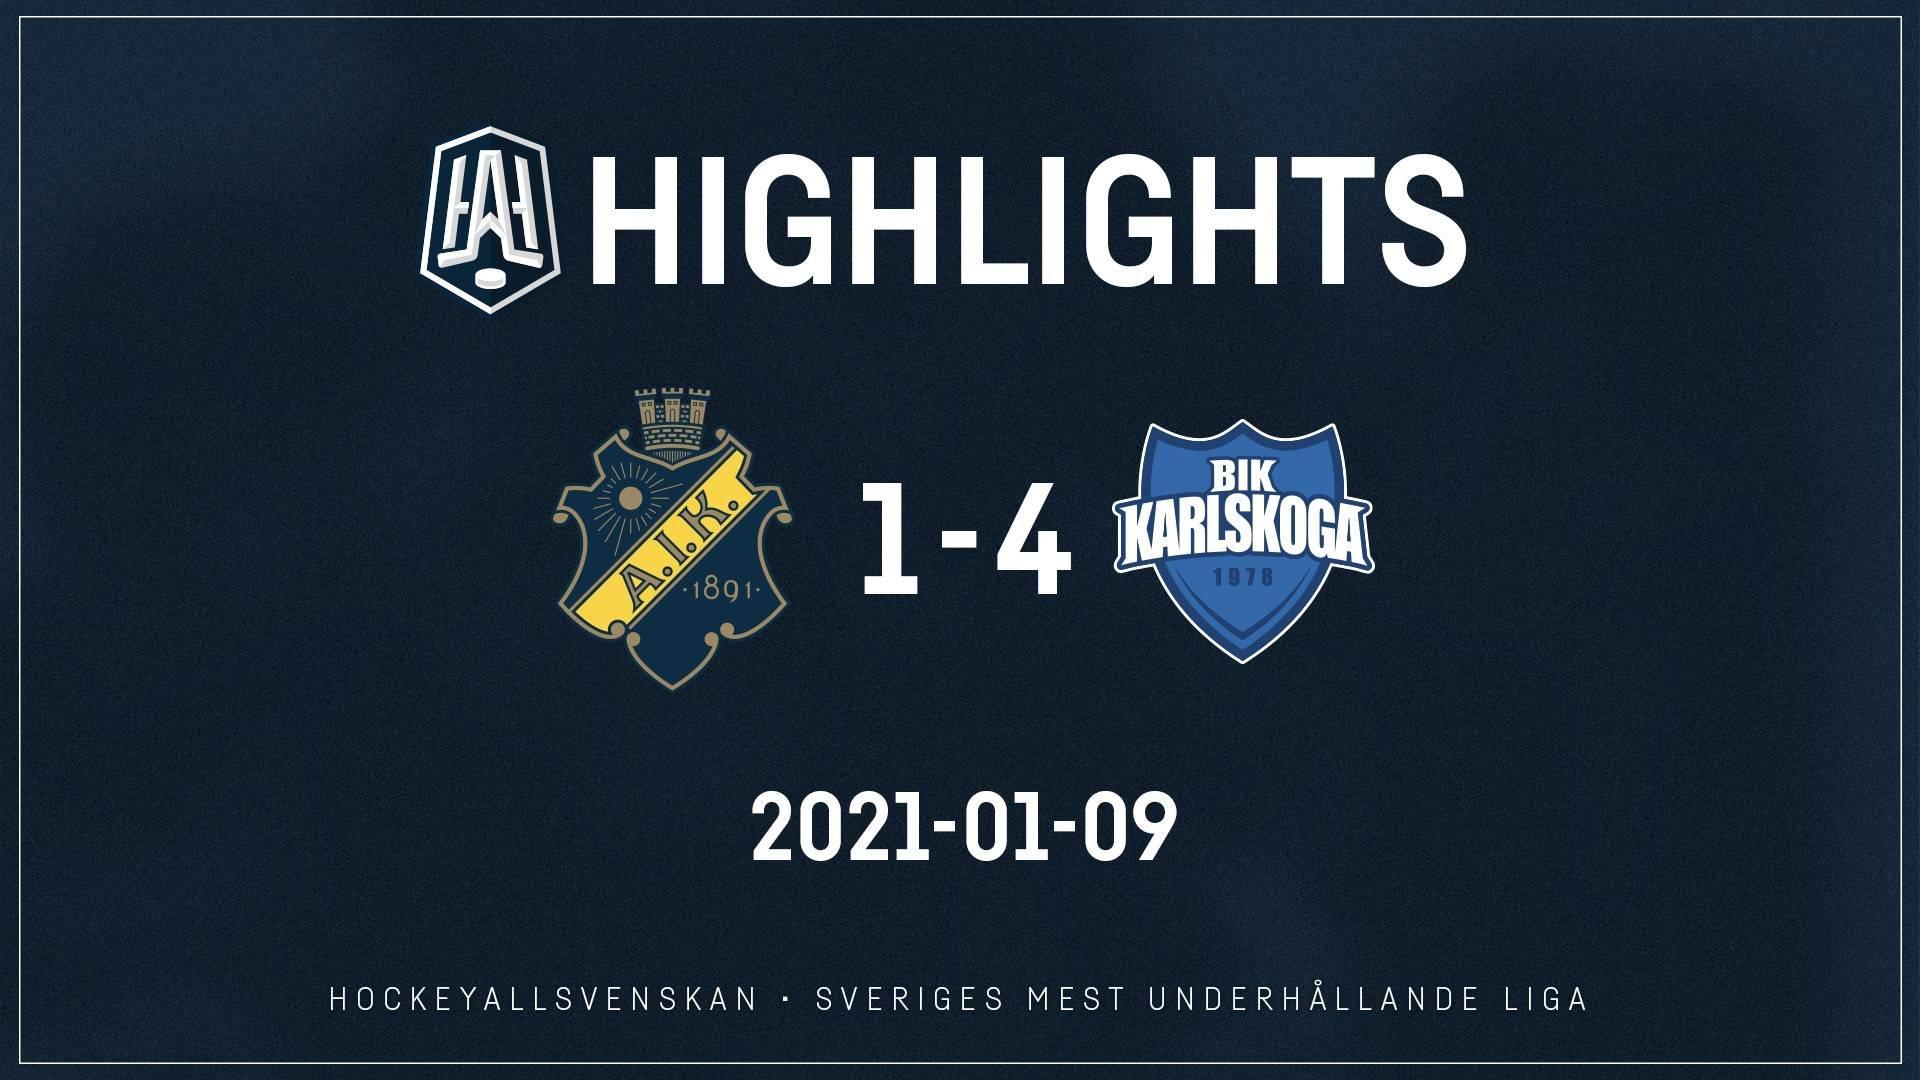 2021-01-09 AIK - Karlskoga 1-4